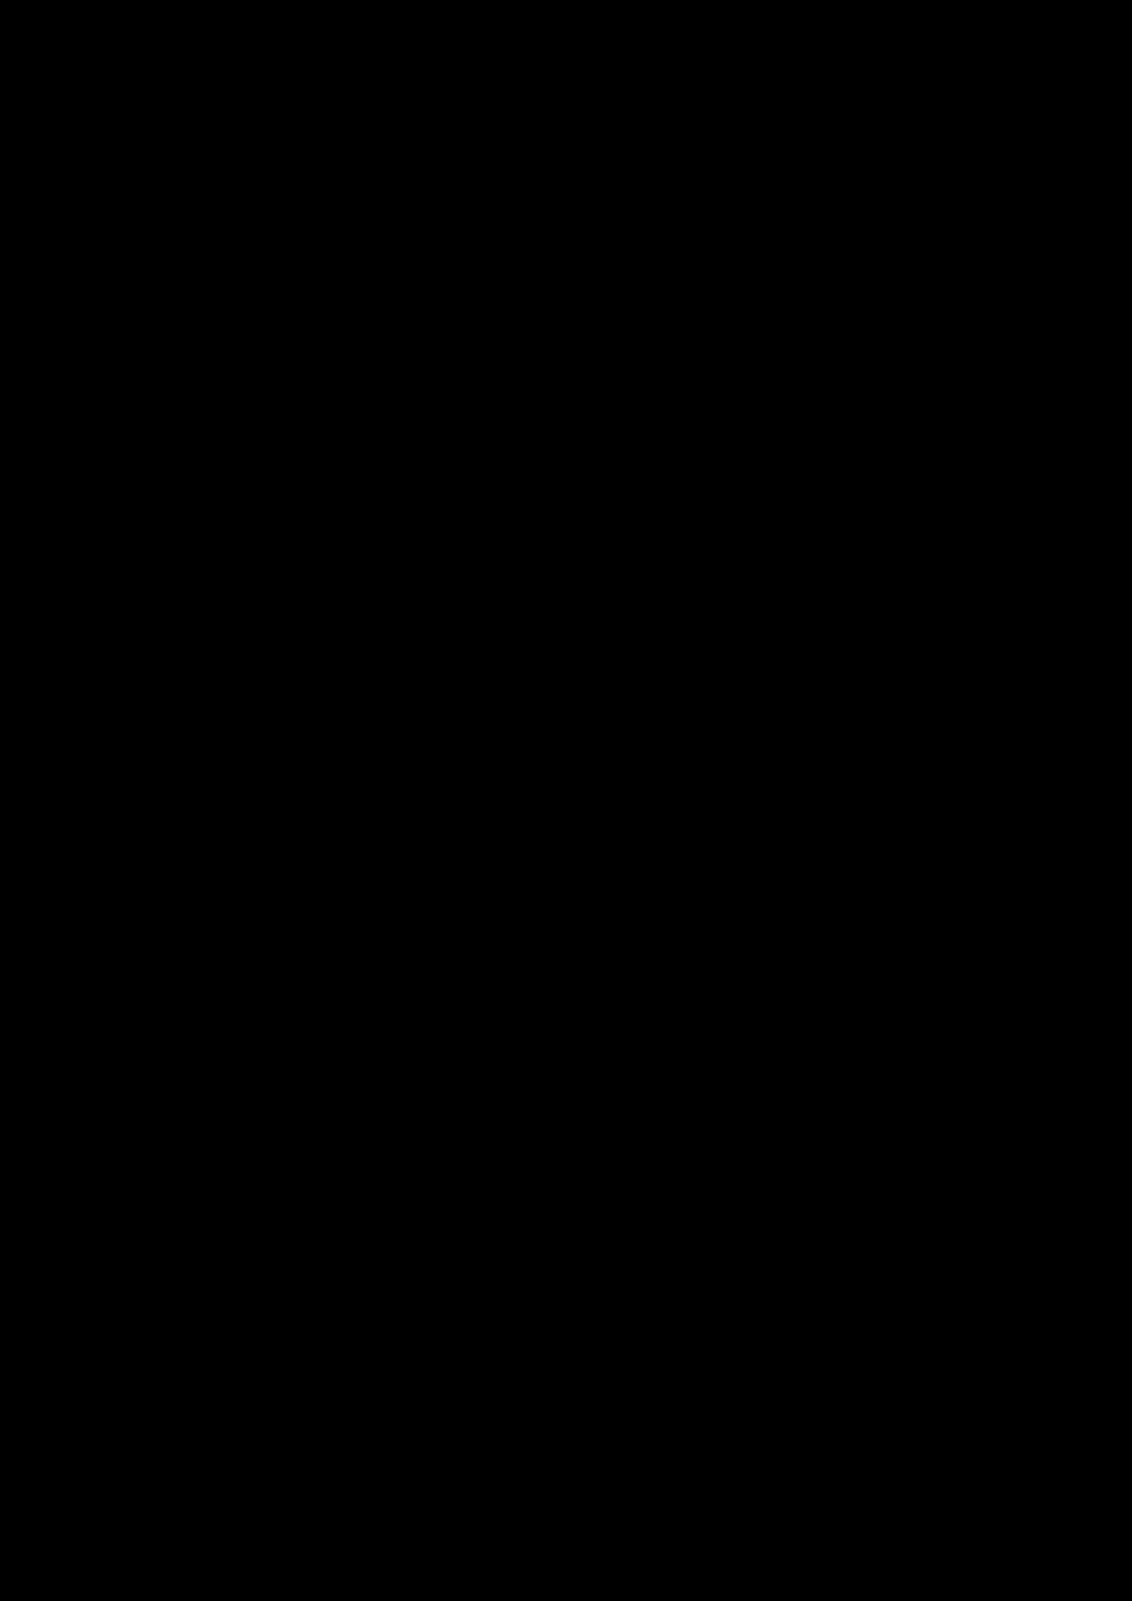 Korolevstvo slez slide, Image 20